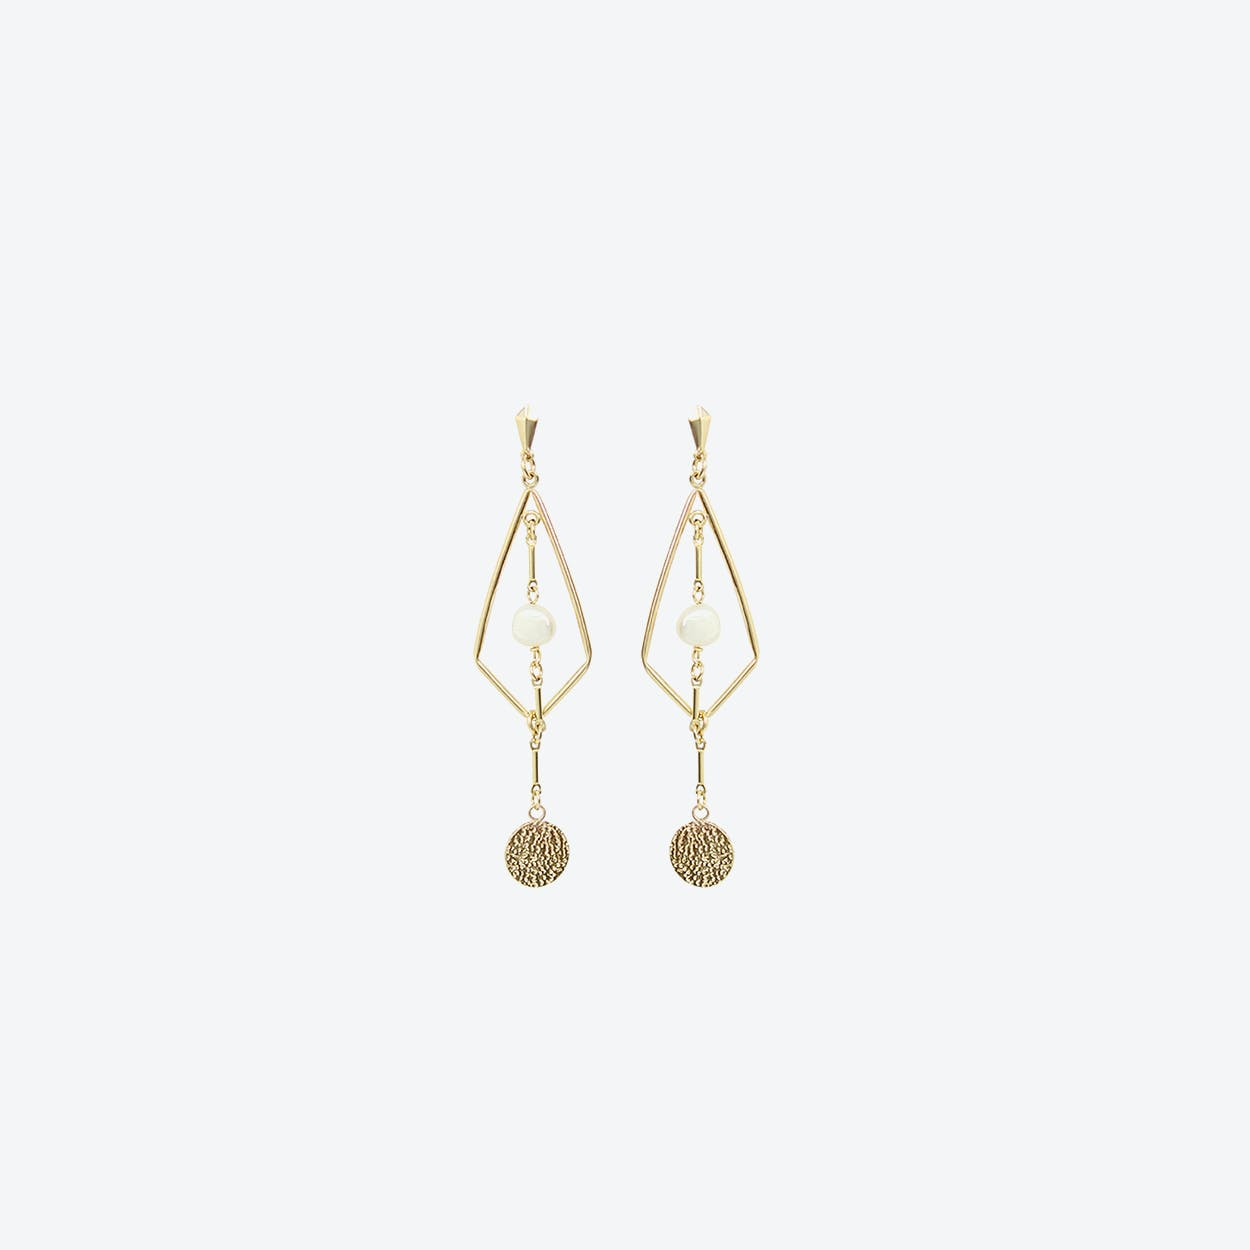 Ralph Gold Earrings